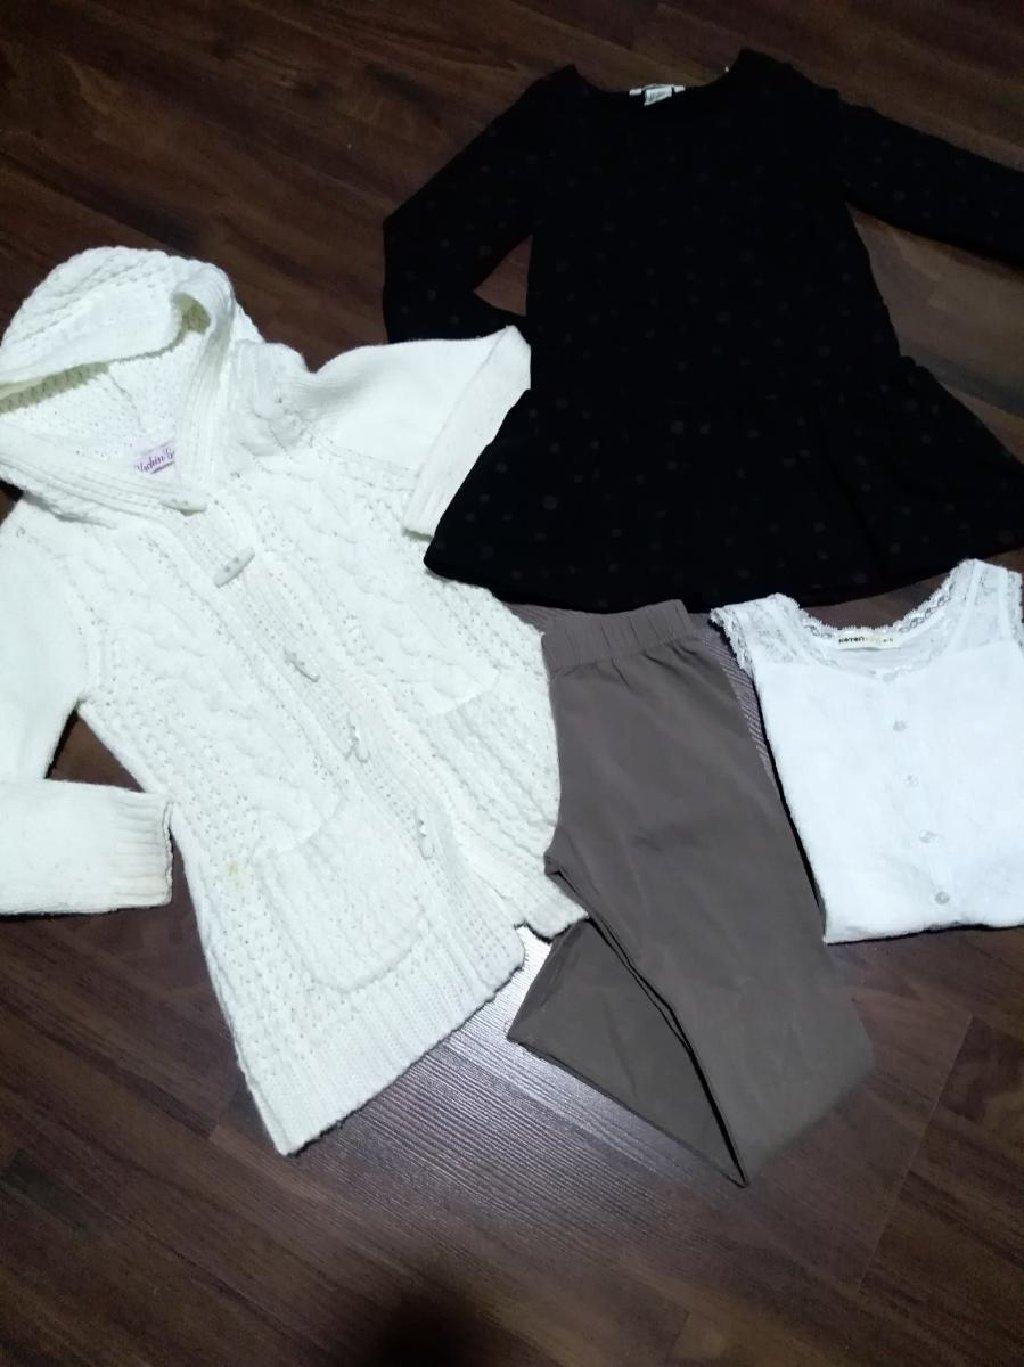 Komplet očuvane garderobe za devojčicu. Veličina 4 - 5. Komplet se: Komplet očuvane garderobe za devojčicu. Veličina 4 - 5. Komplet se